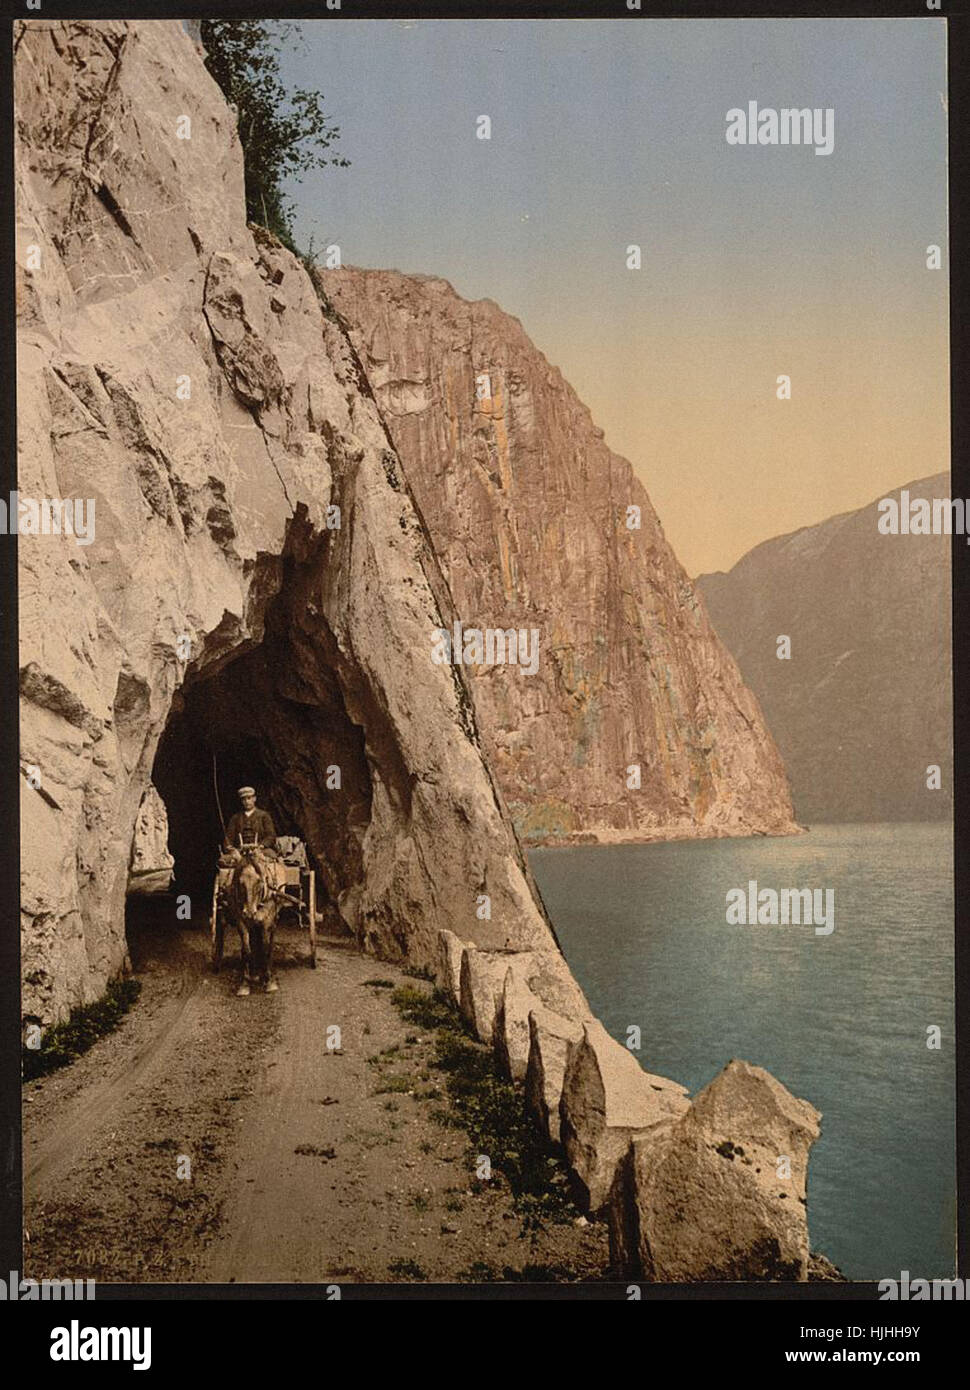 Road to Vorinfos (i.e., V_u00f8ringsfoss), Hardanger Fjord, Norway  - Photochrom XIXth century - Stock Image